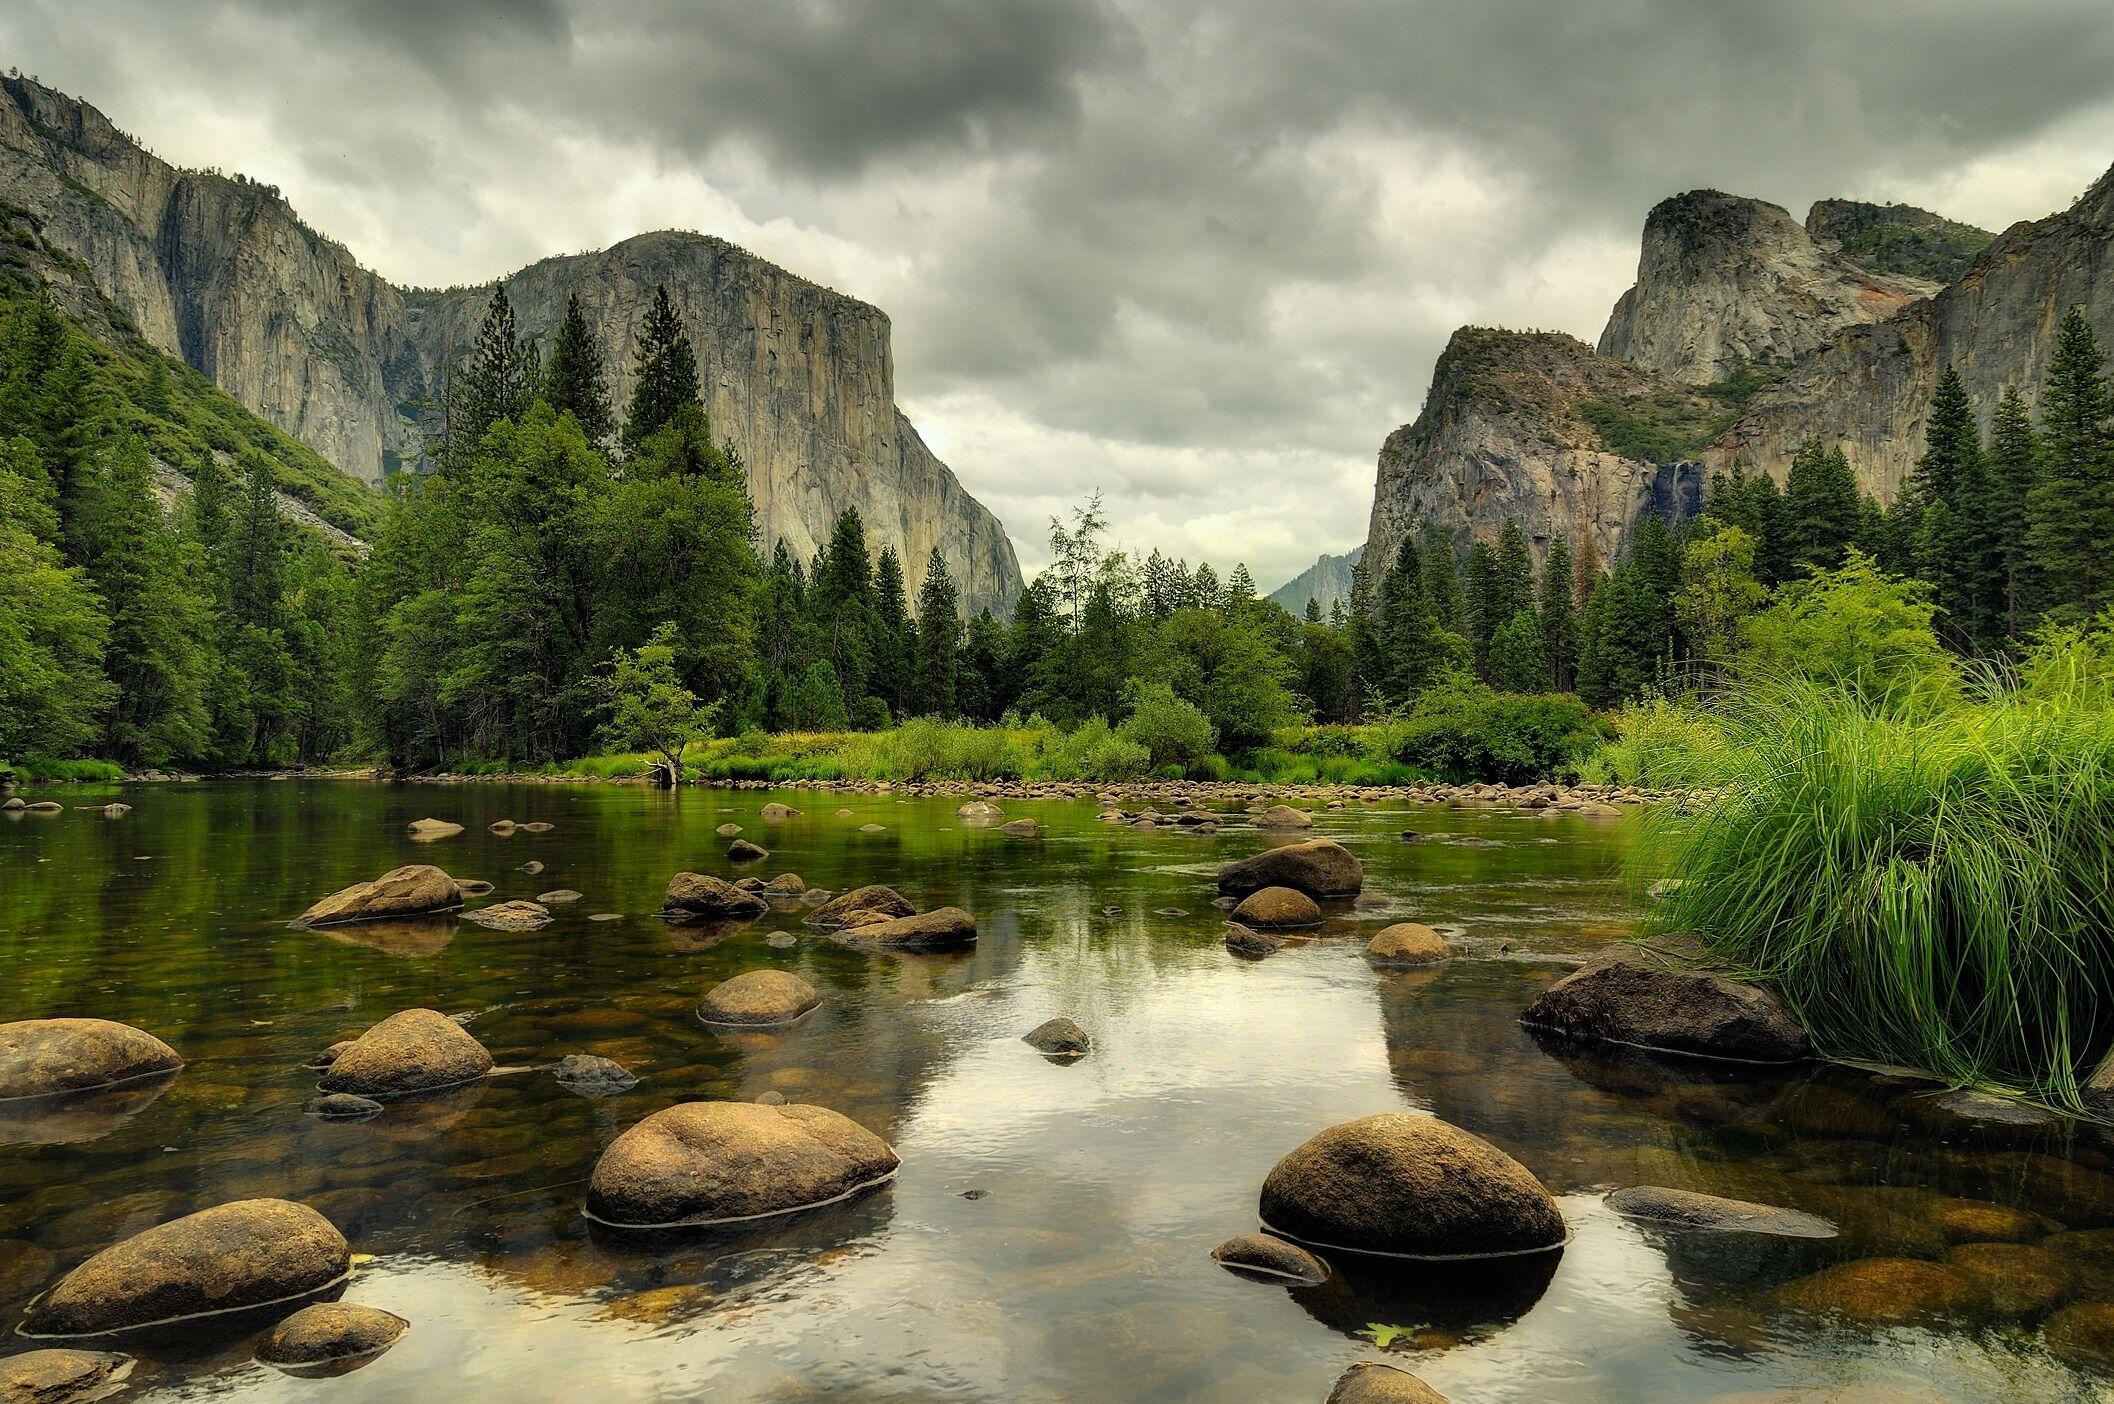 Лес горы и река картинки и обои (14)